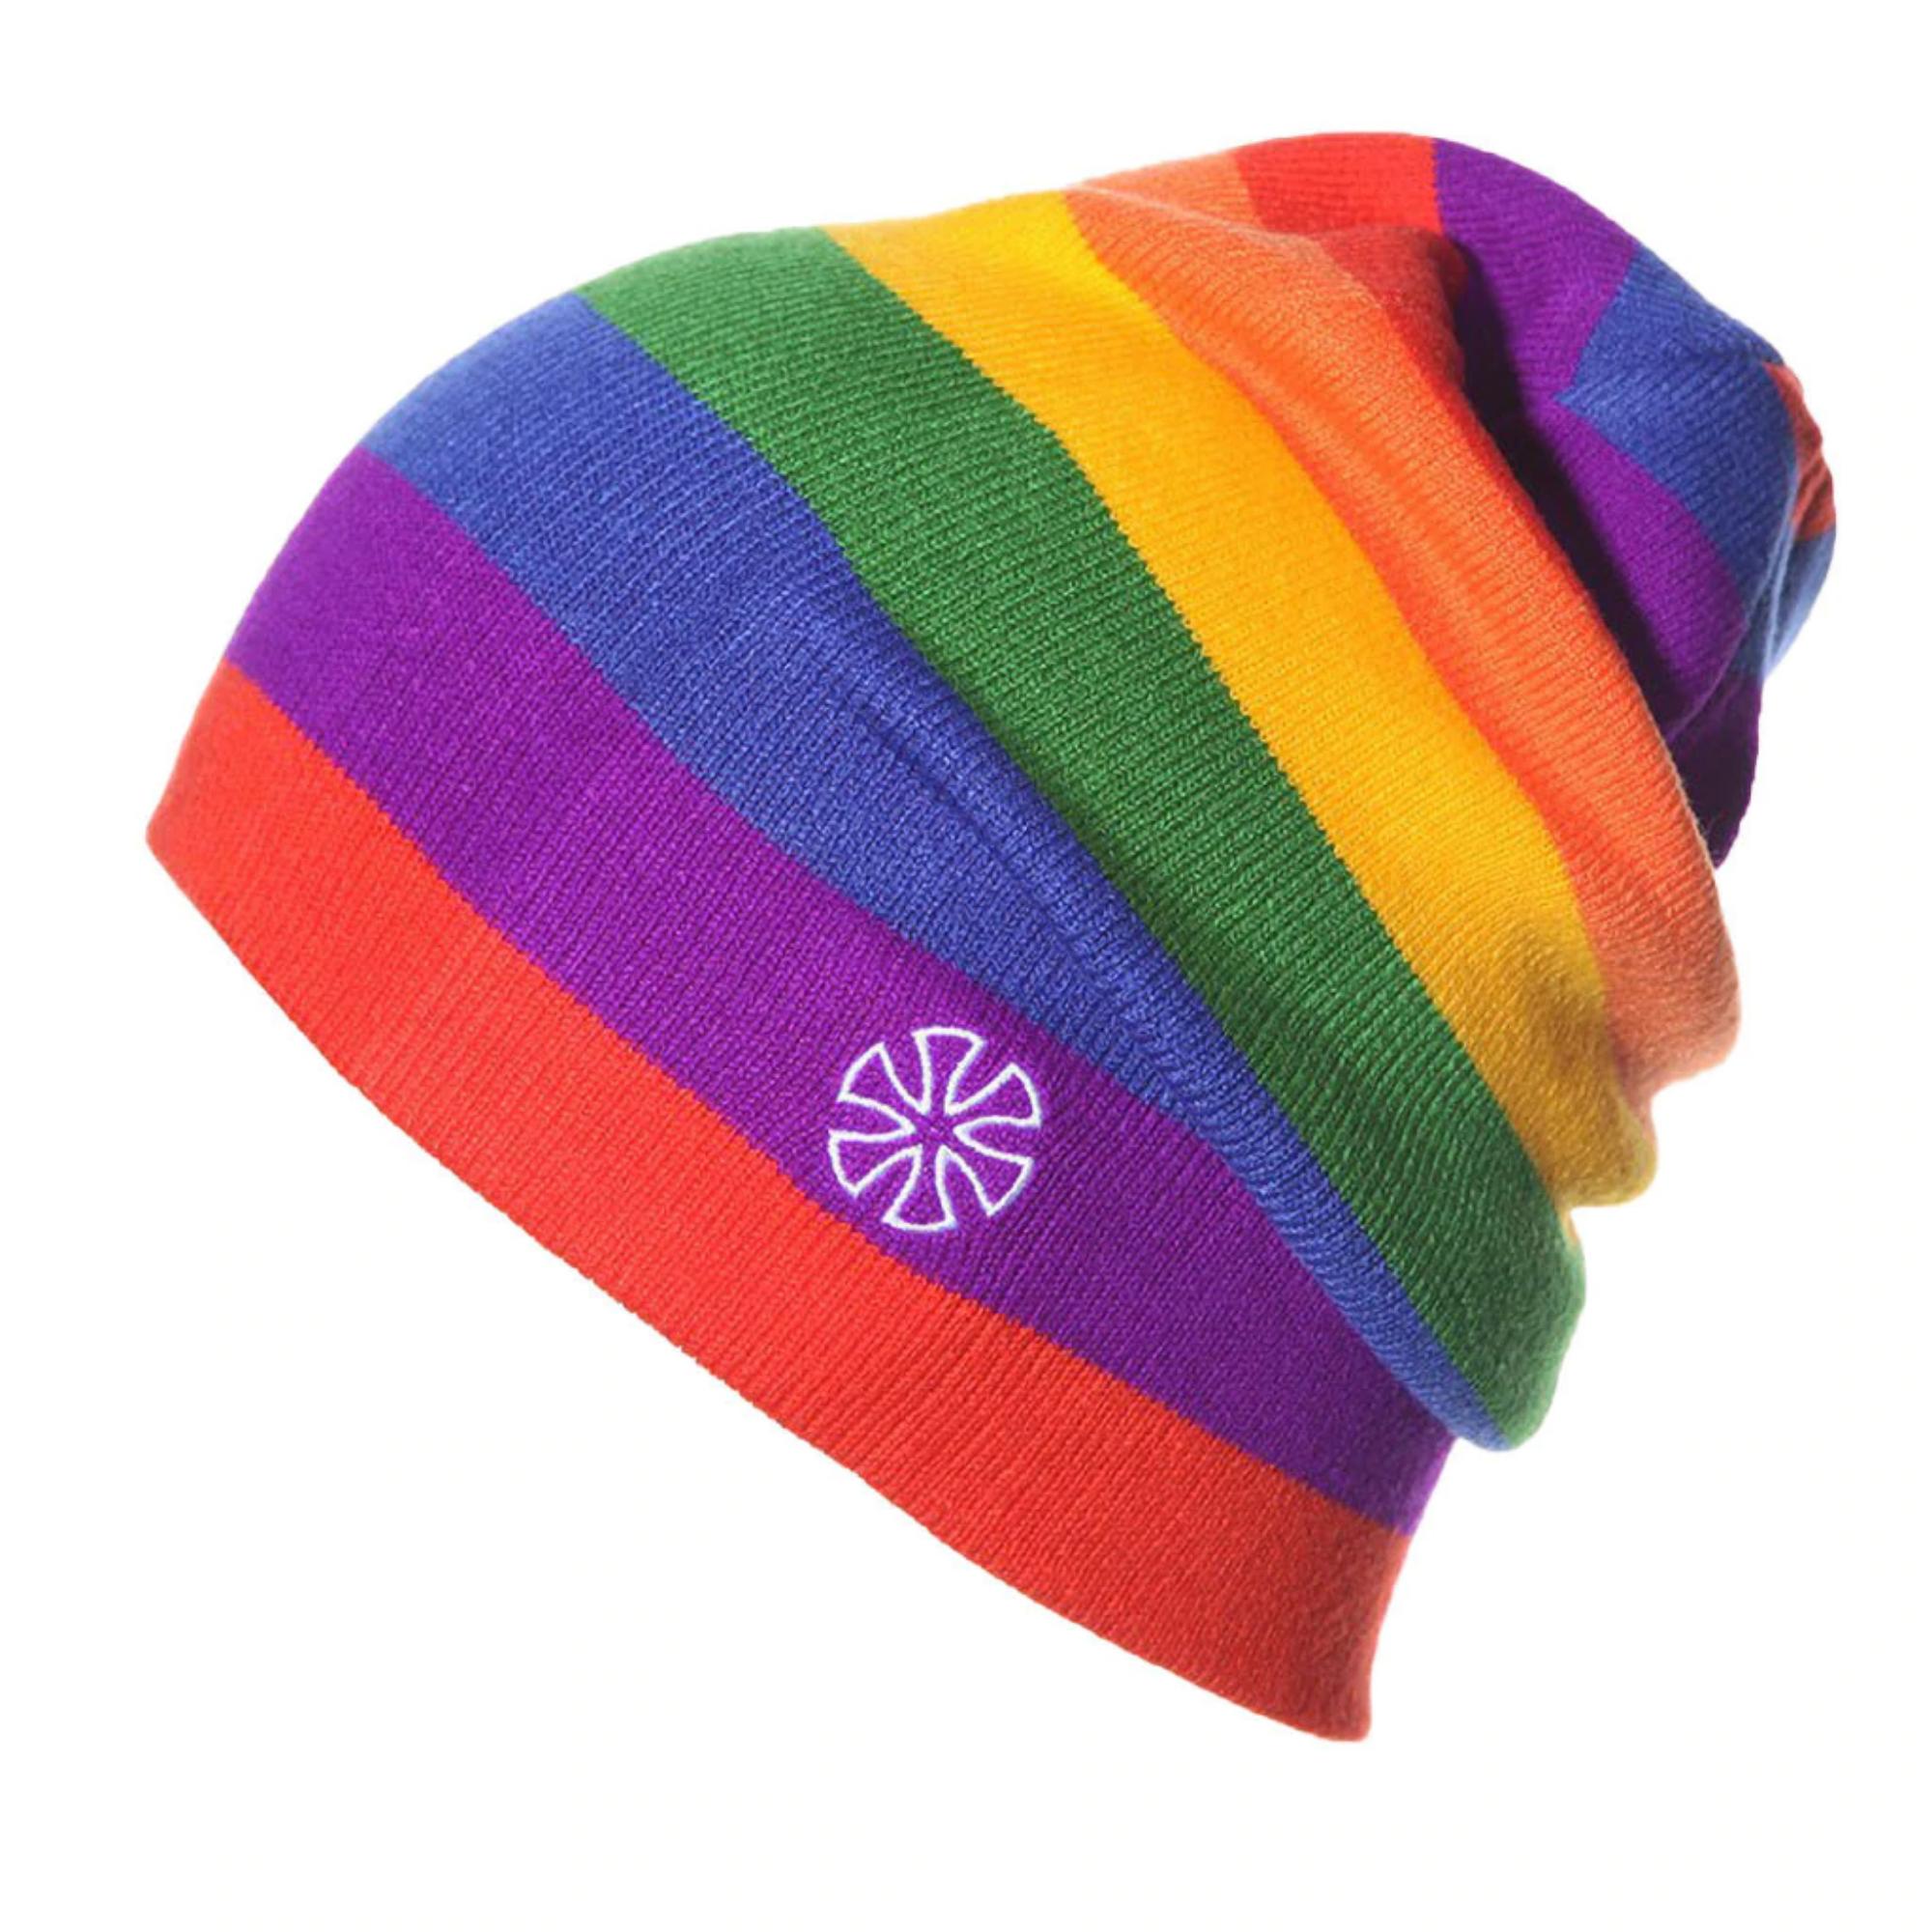 Knitted Rainbow Winter Beanie Hatbeanie Hat For Womenbeanie Etsy In 2021 Winter Hats For Men Winter Hats For Women Knit Hat For Men